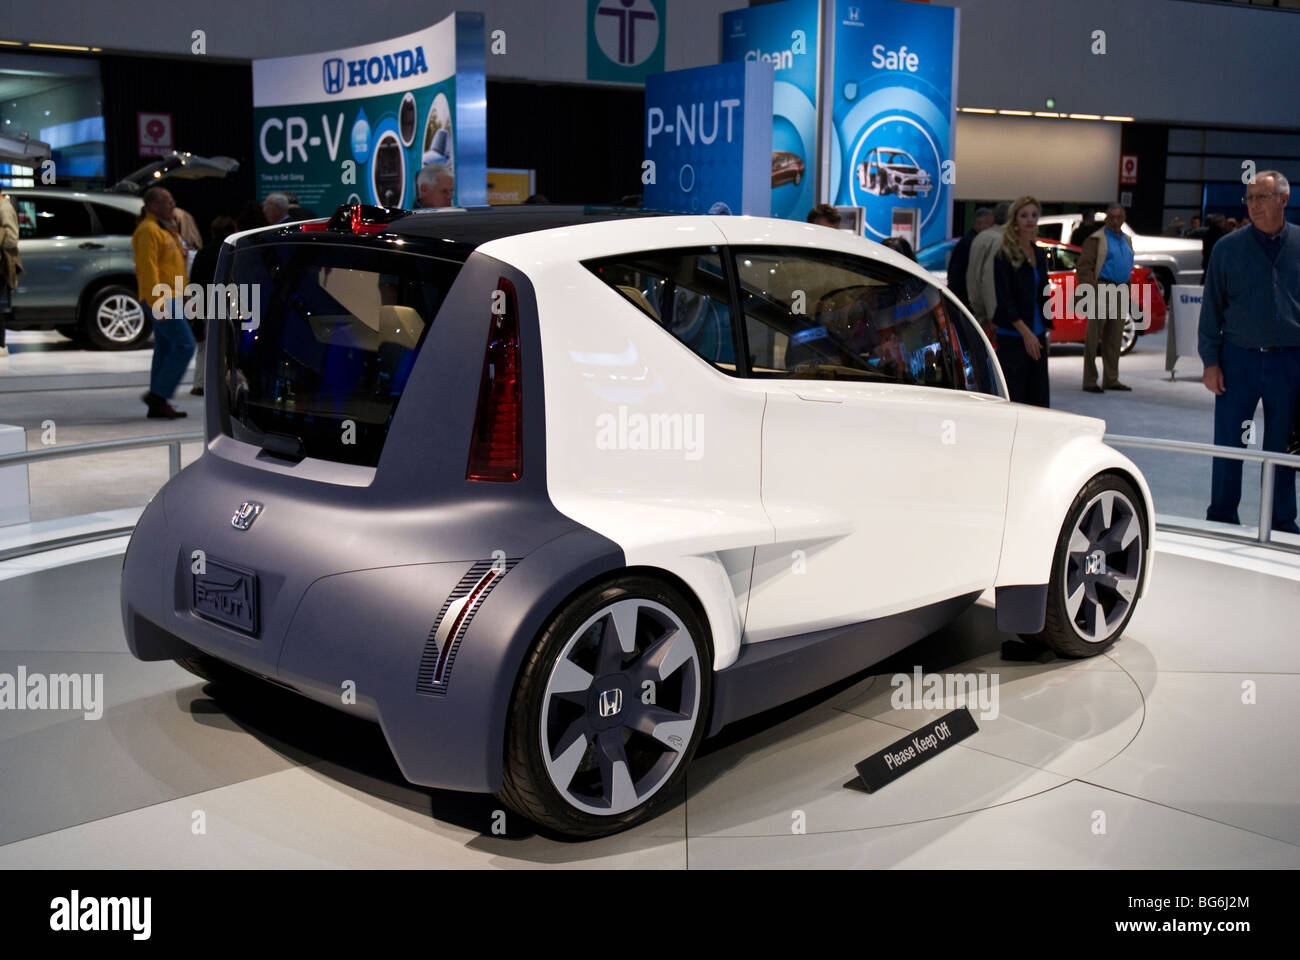 The Honda PNUT Concept World Debut At The LA Auto Show In - Honda center car show